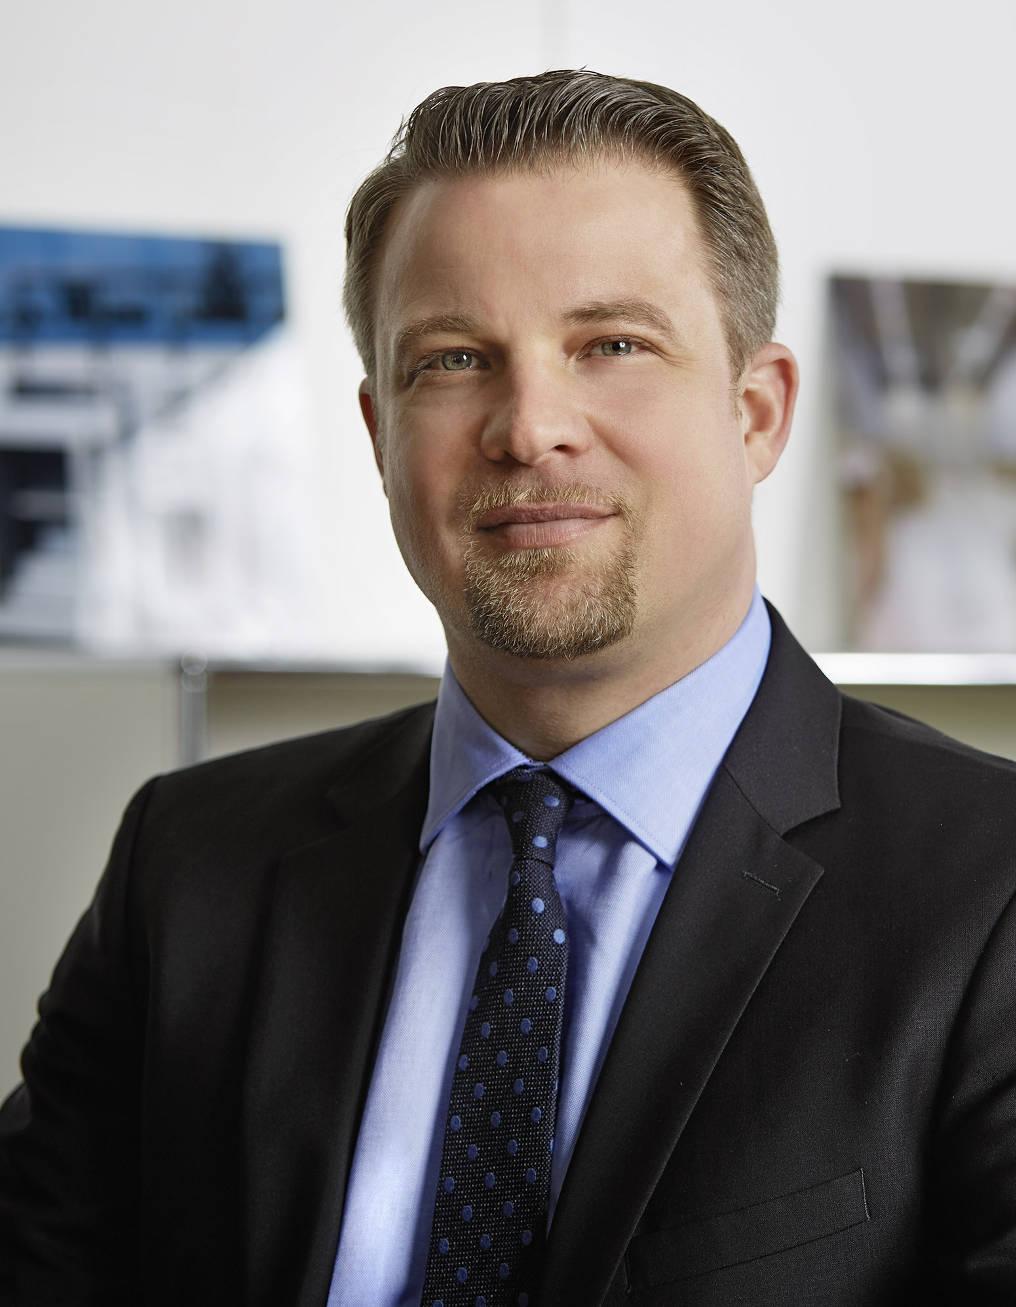 Rechtsanwalt Insolvenz Mannheim und Heilbronn